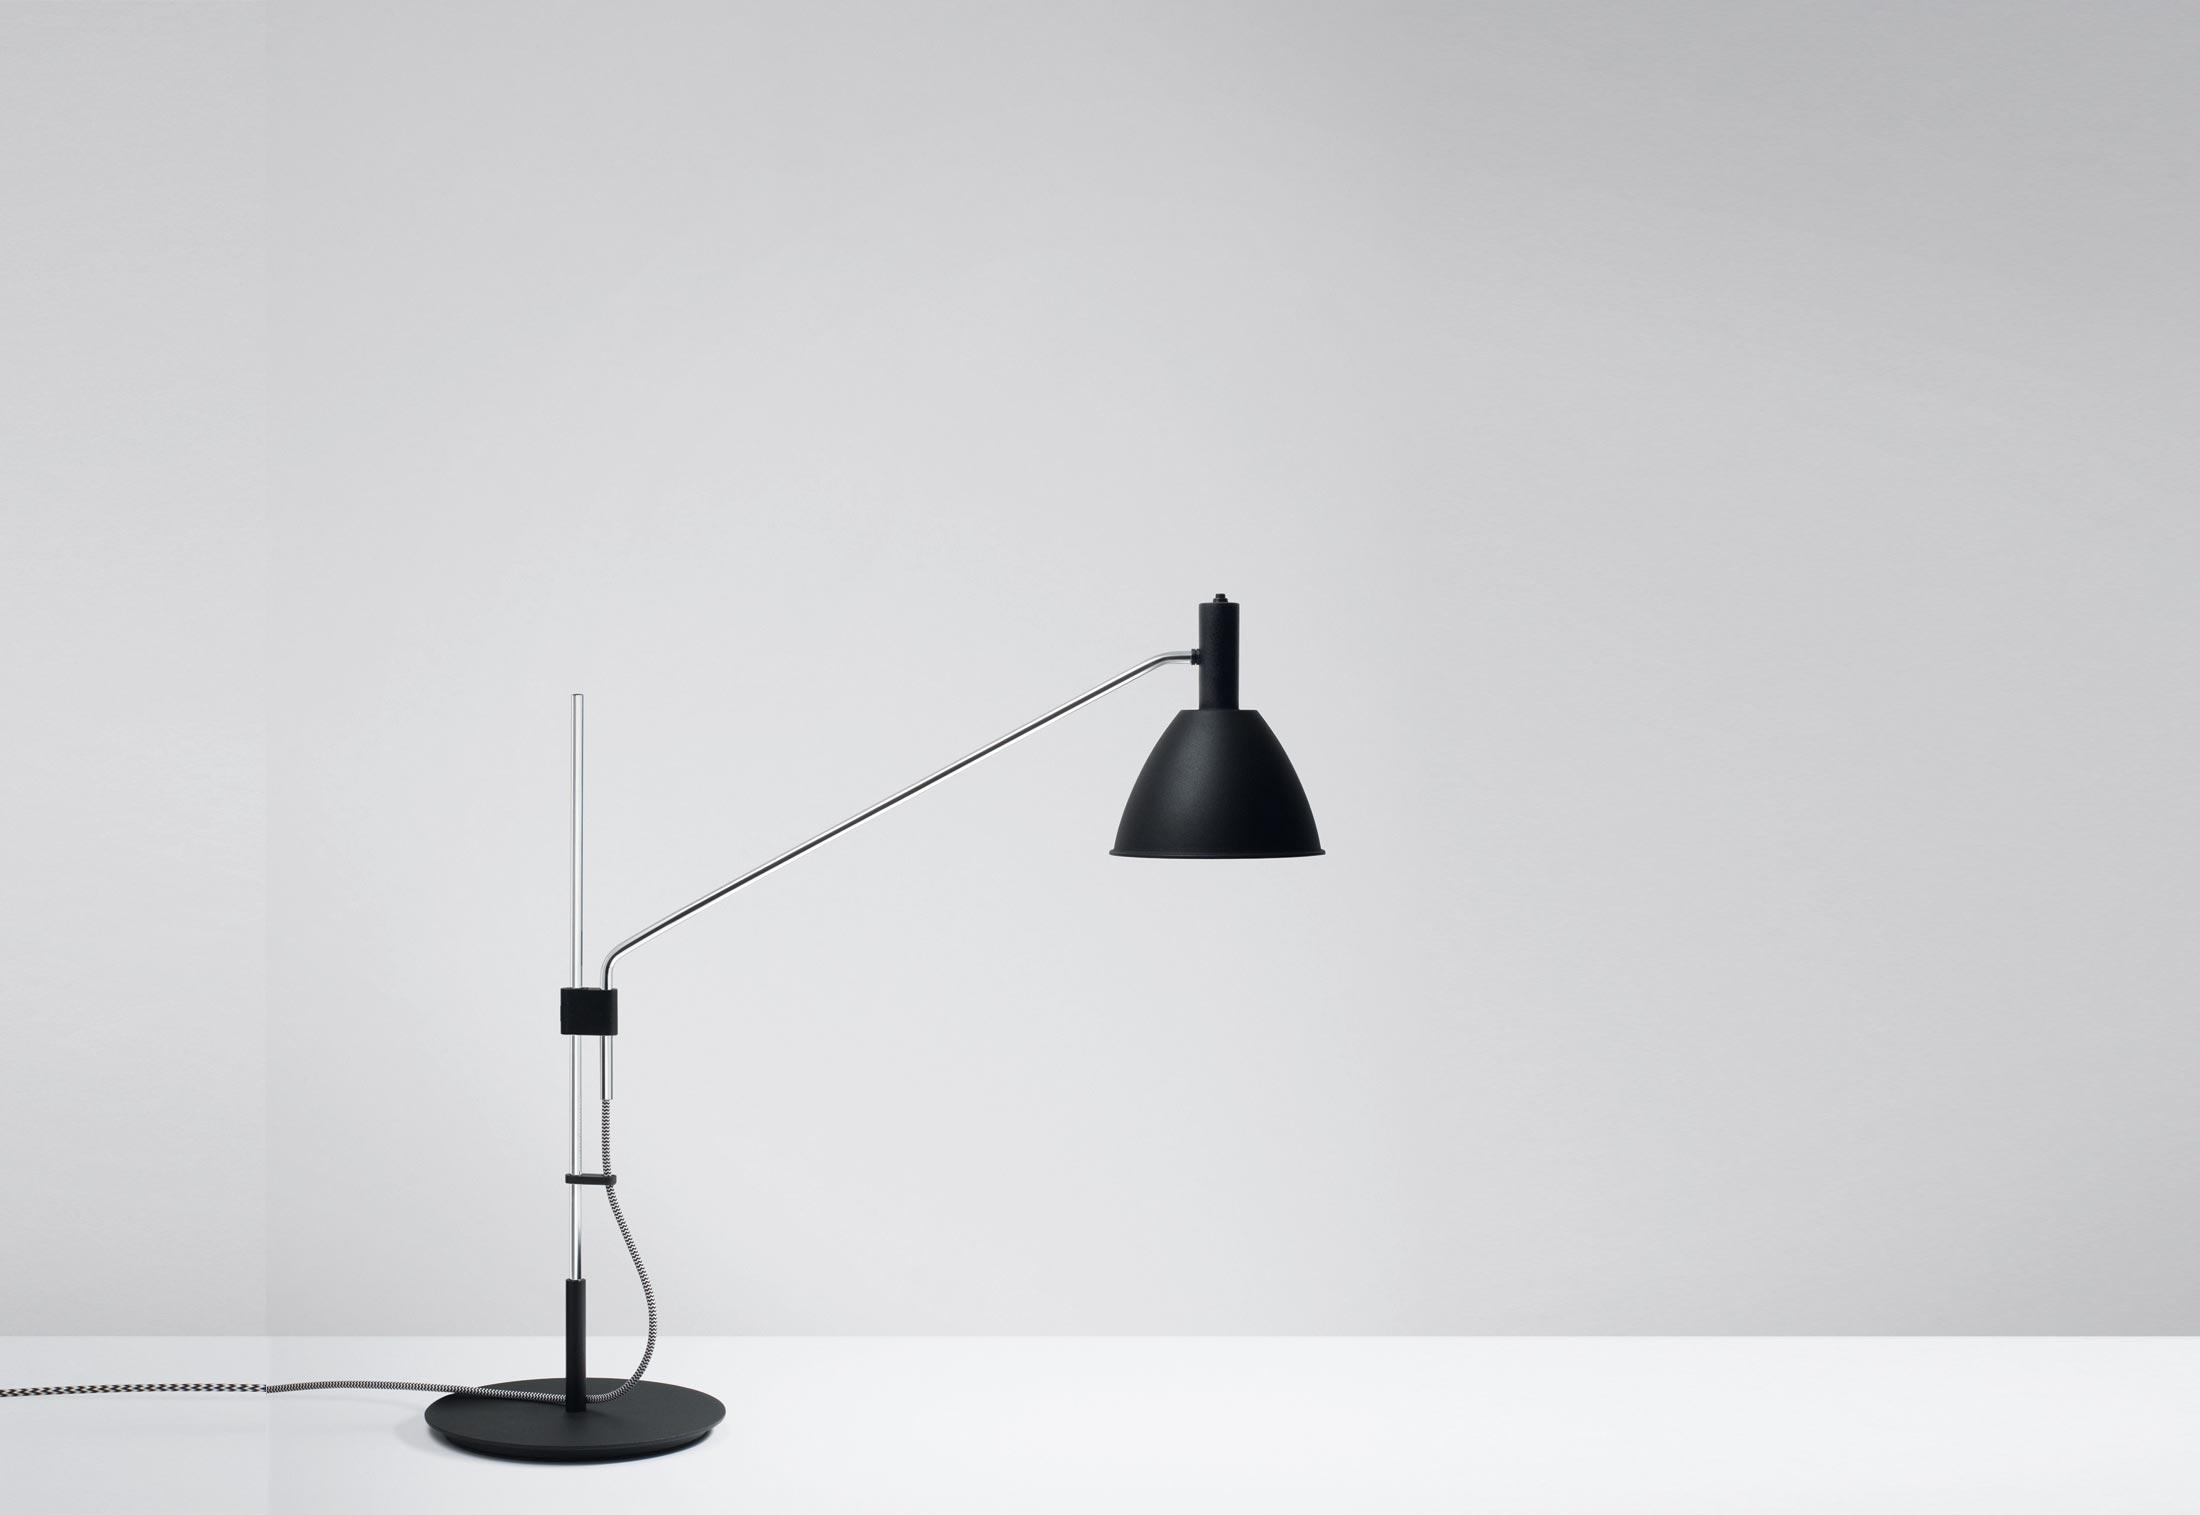 bauhaus 90 t led by lumini stylepark. Black Bedroom Furniture Sets. Home Design Ideas